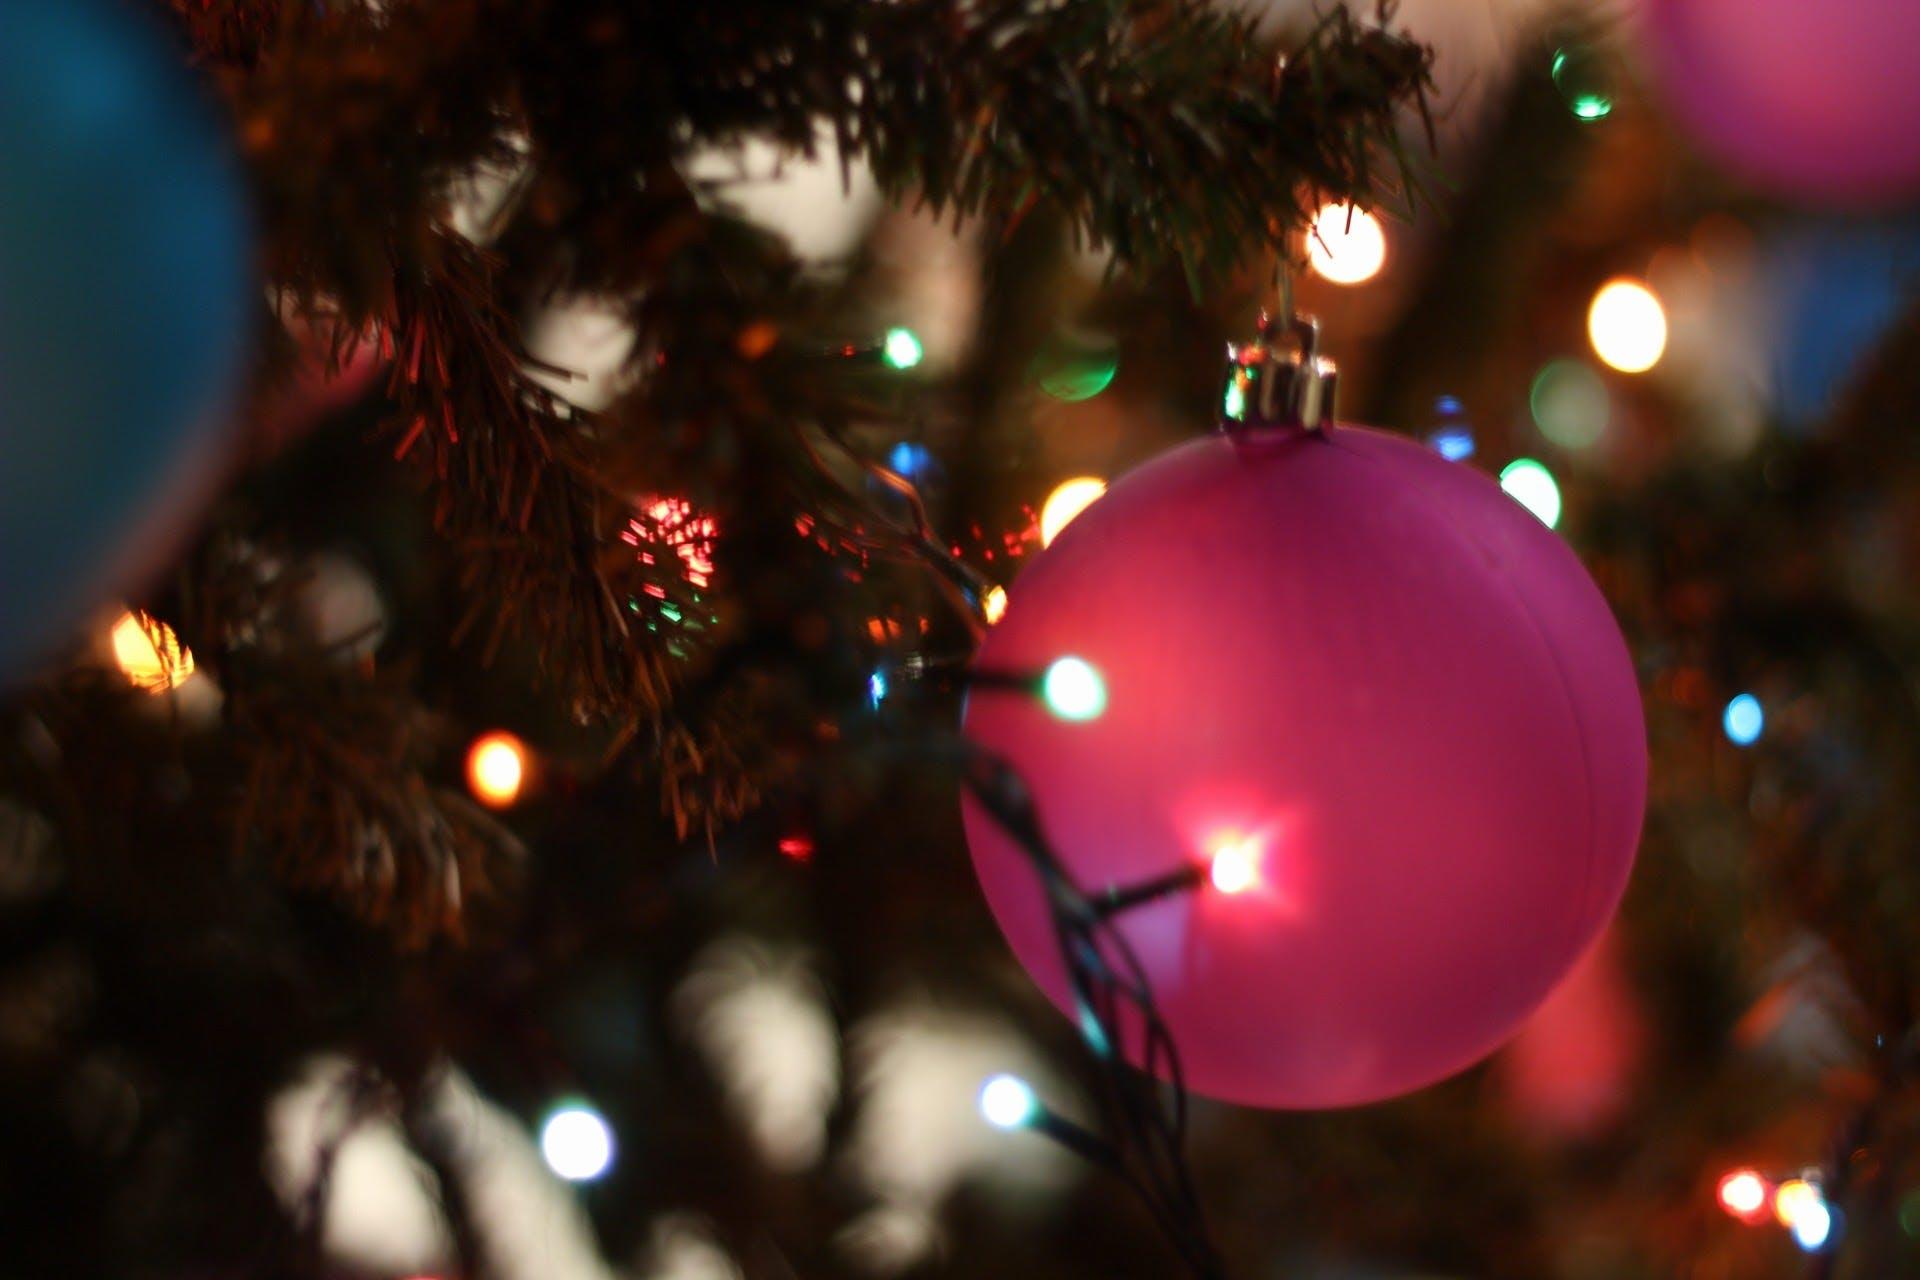 Kostenloses Stock Foto zu bälle, beleuchtet, beleuchtung, bunt